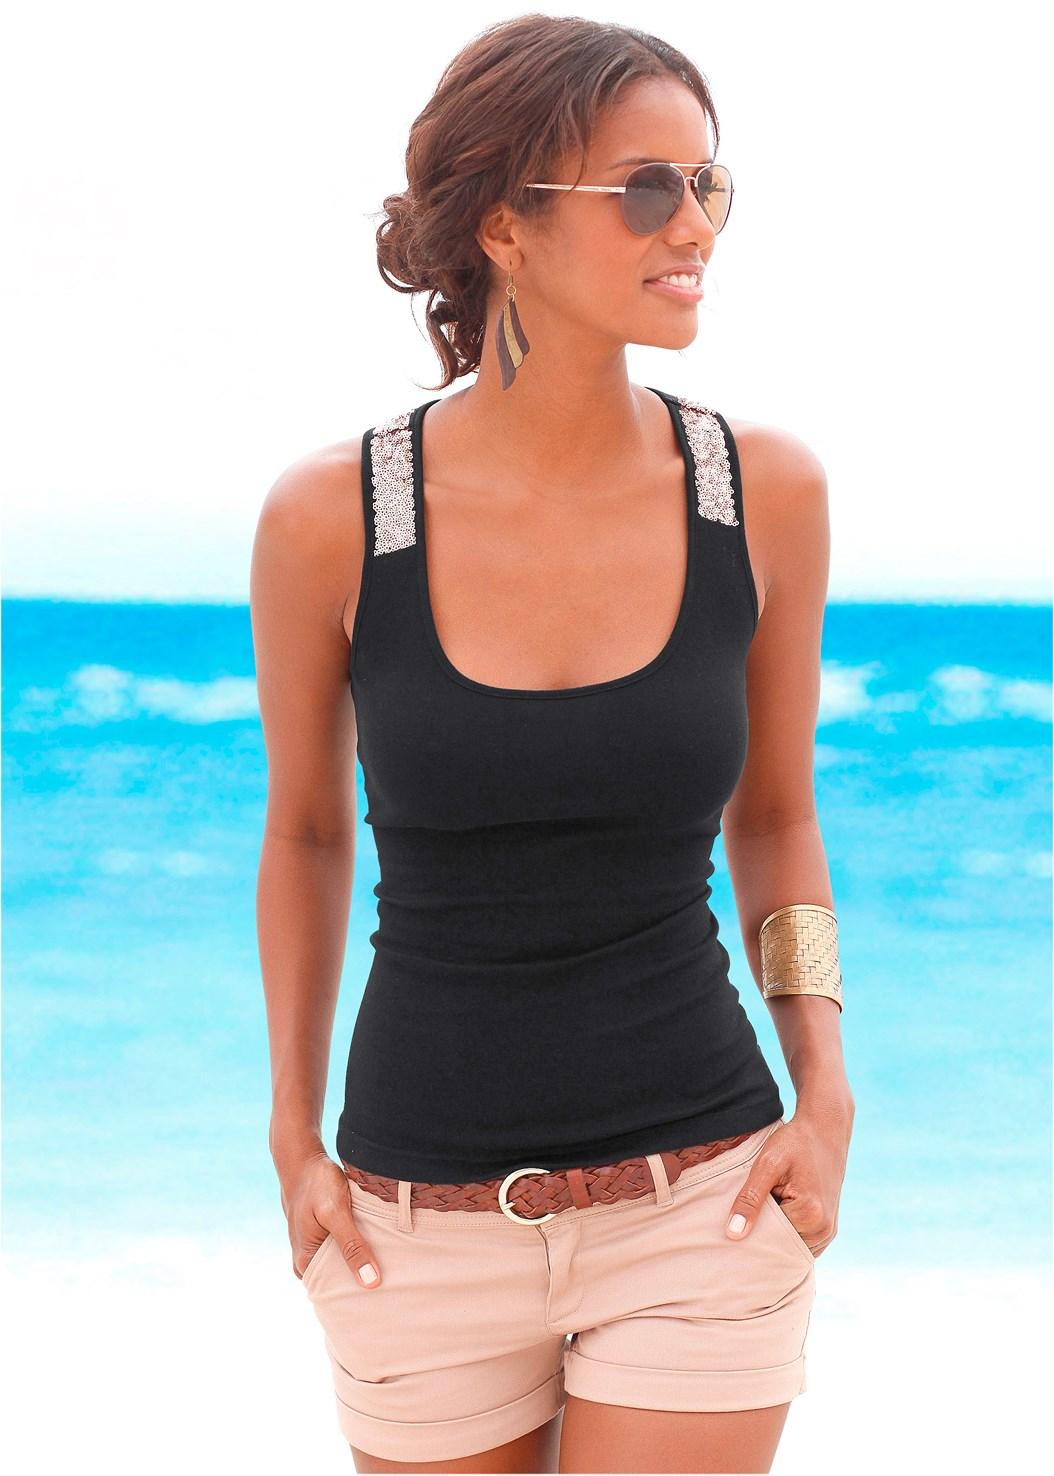 Sequin Detail Tank,Frayed Cut Off Jean Shorts,Strapless Bra